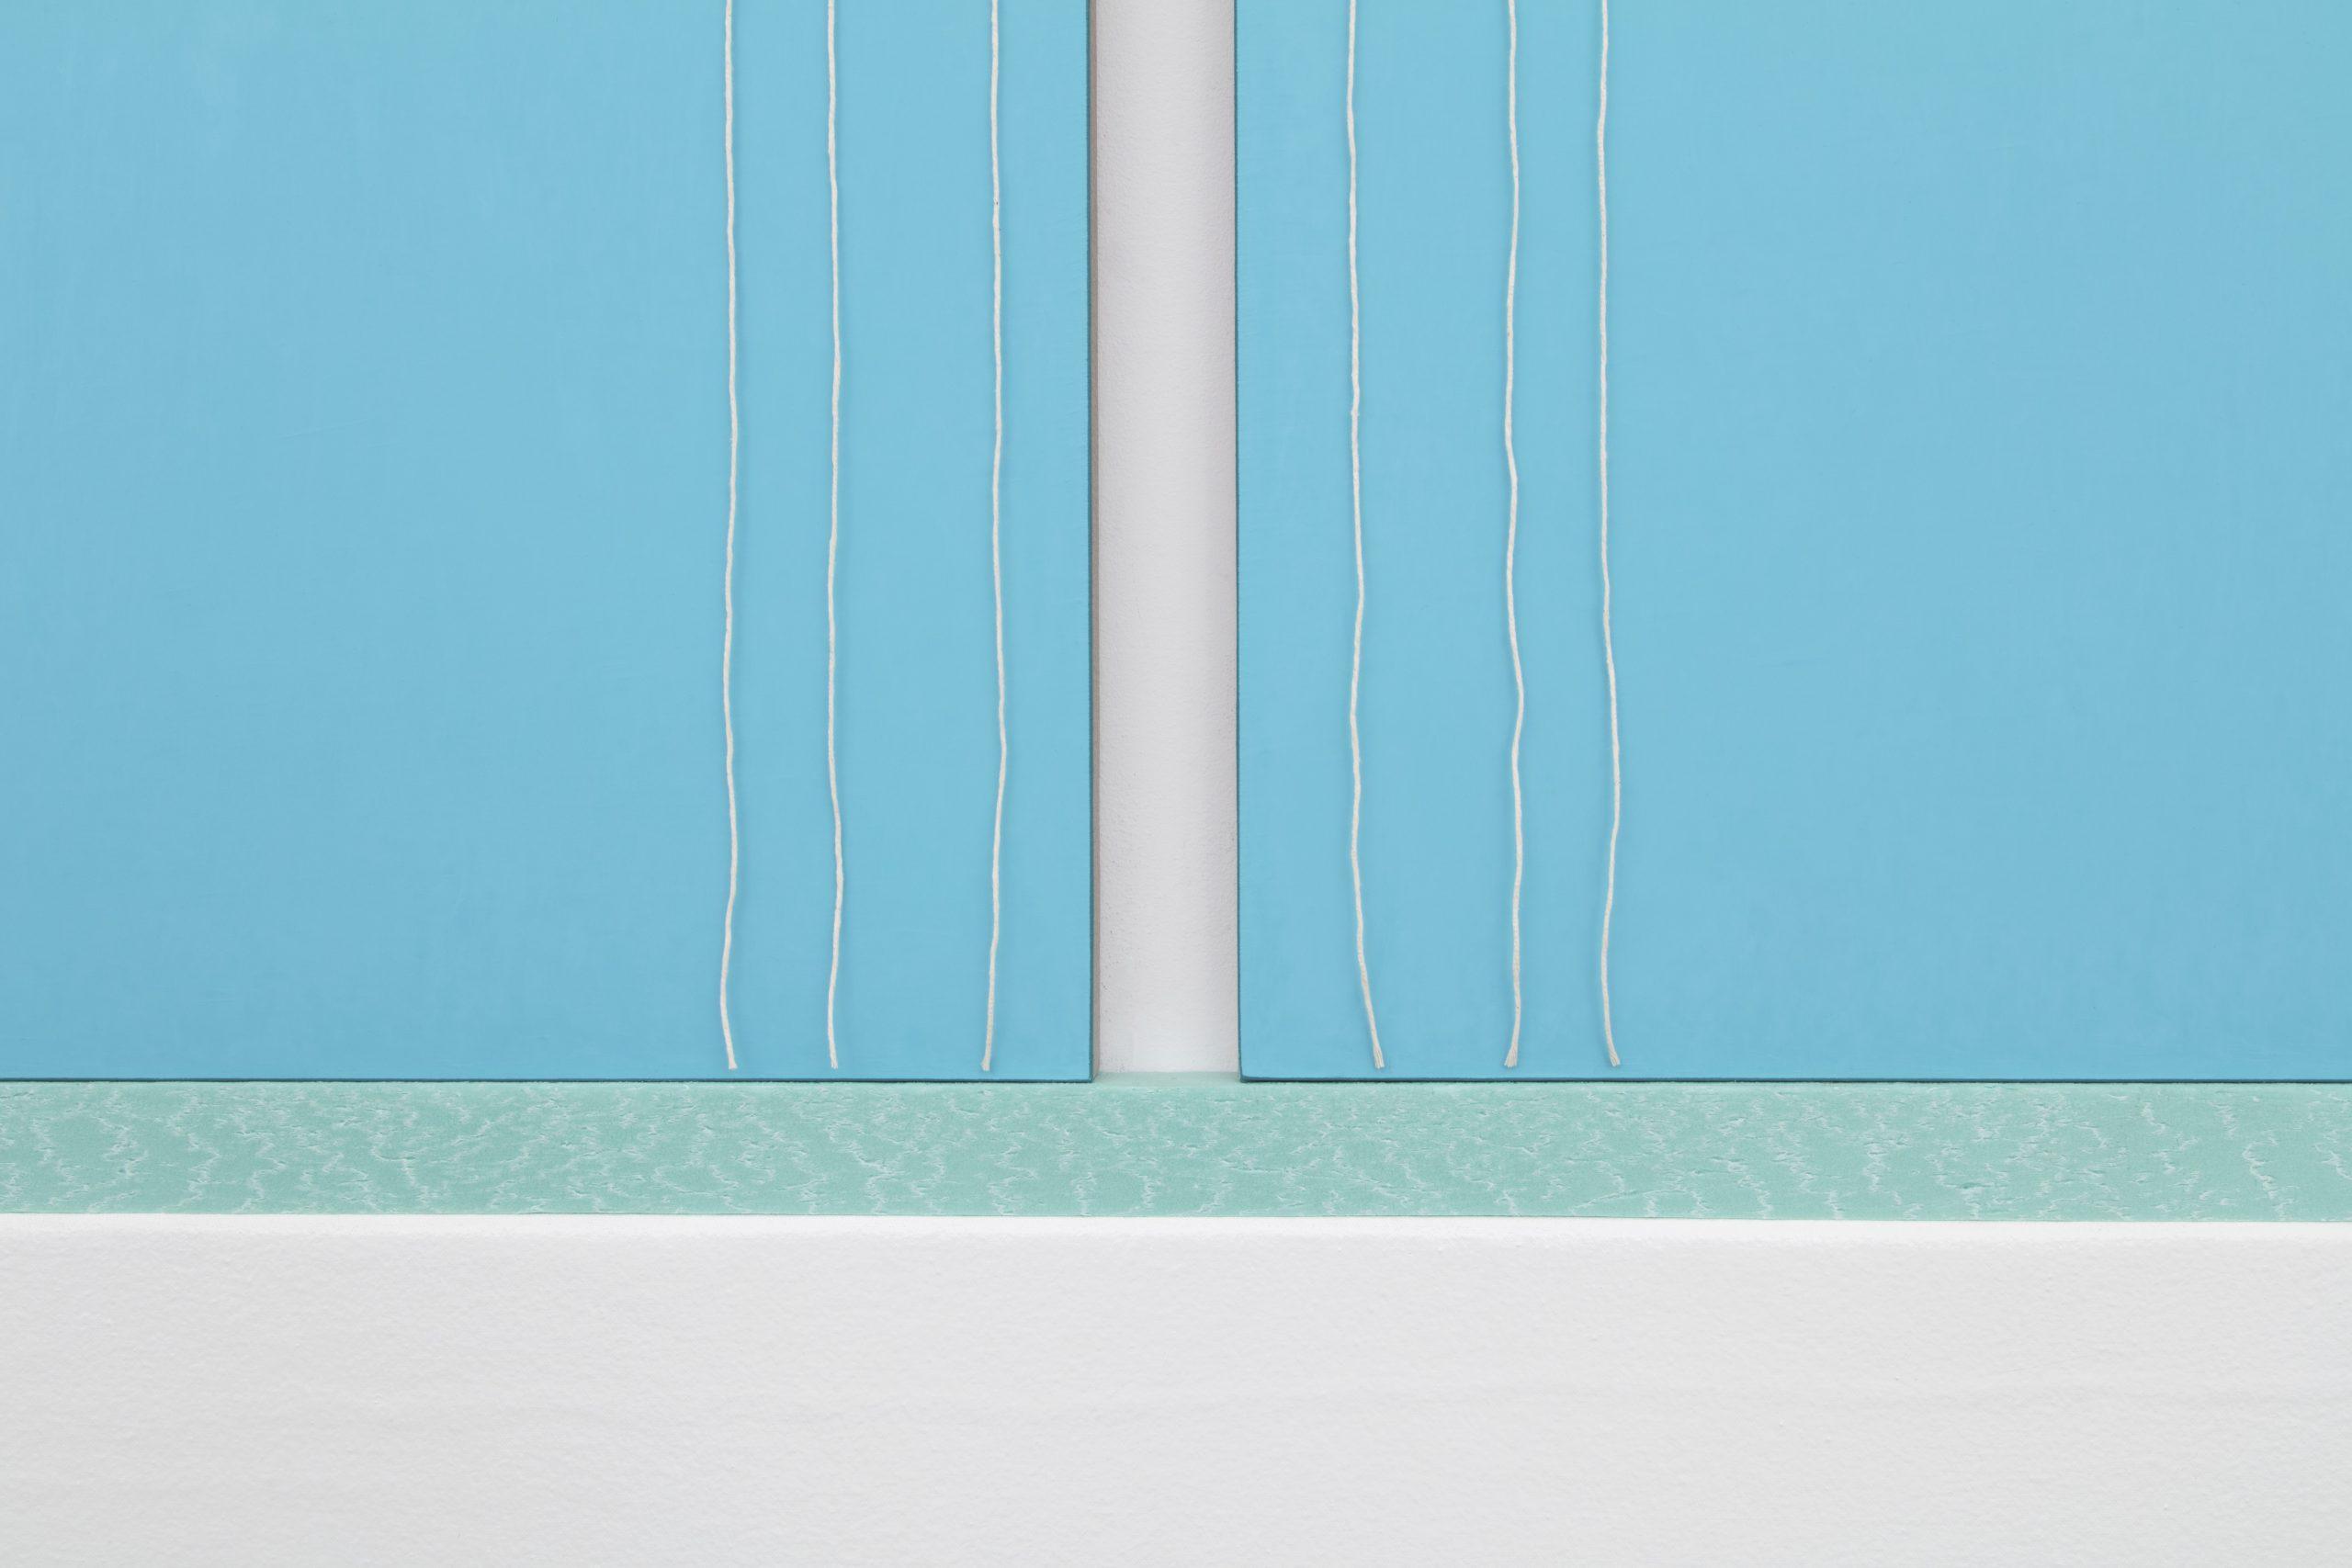 N. Dash Untitled, 2017 (detail); adobe, oil, pigment, acrylic, gesso, string, canvas, linen, styrofoam, jute, wood support; photo Jean Vong; Courtesy the artist, Casey Kaplan Gallery, New York, and Mehdi Chouakri, Berlin